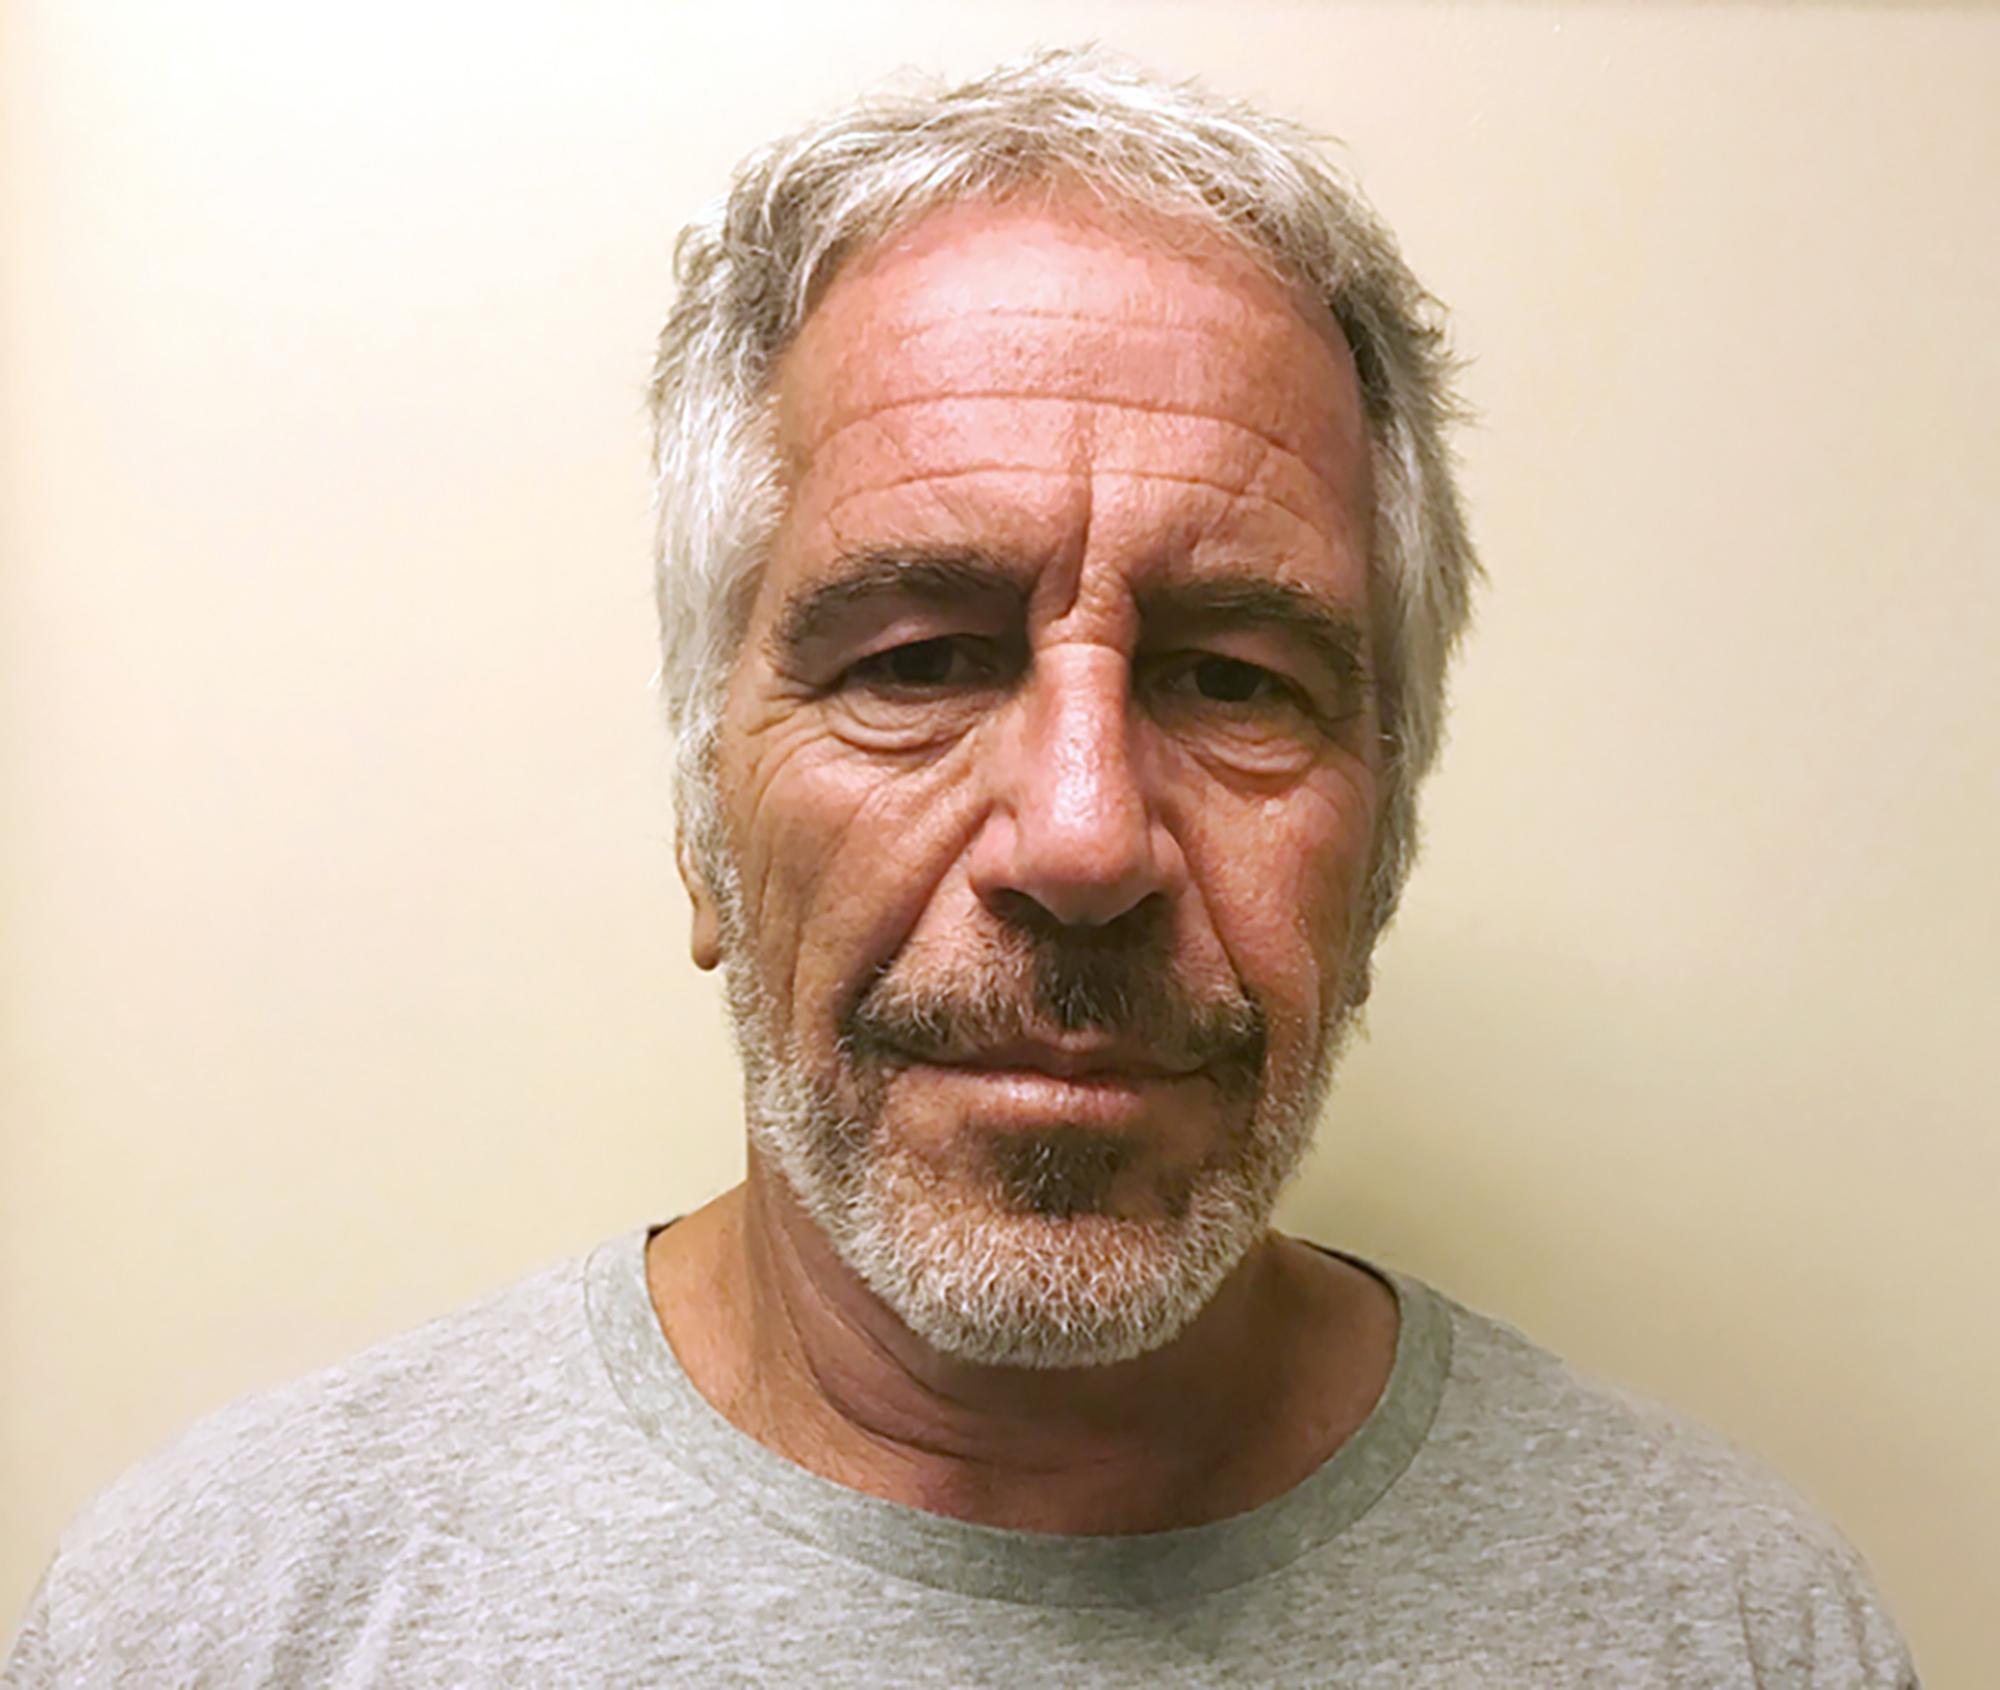 Judge Richard Berman dismisses Jeffrey Epstein indictment